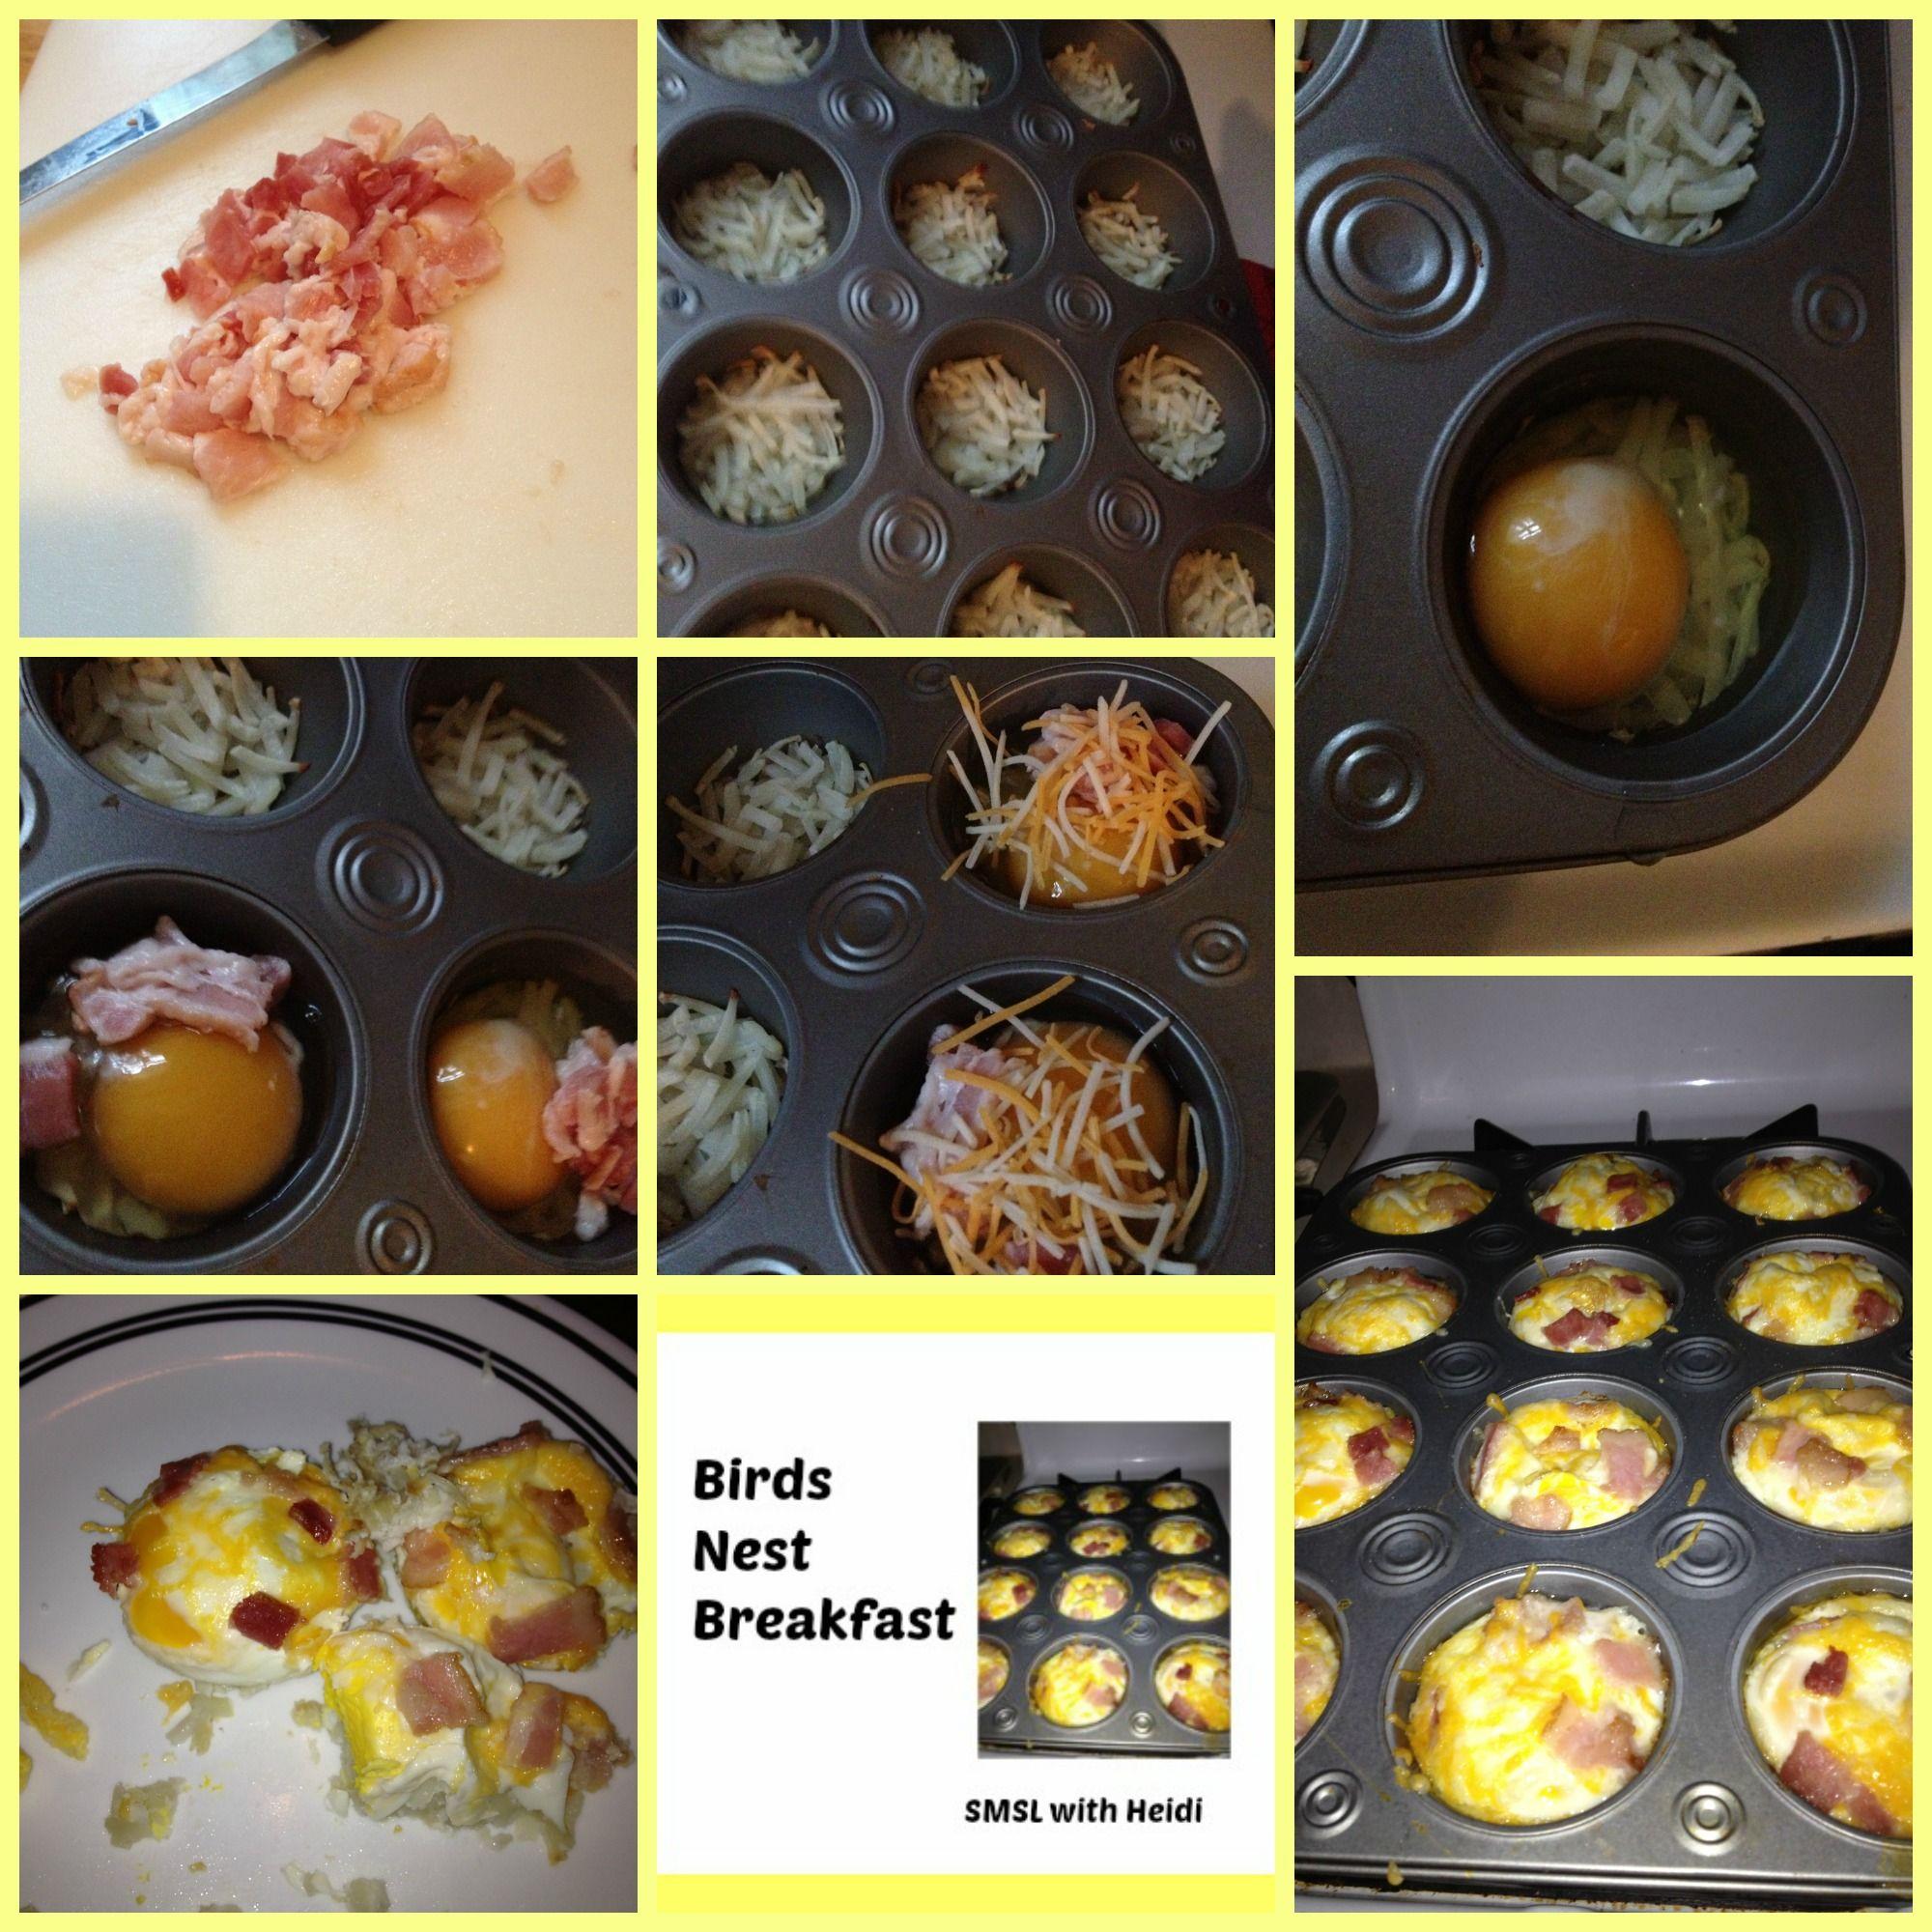 Birds Nest Breakfast Recipe Breakfast Recipes Recipes Yummy Food